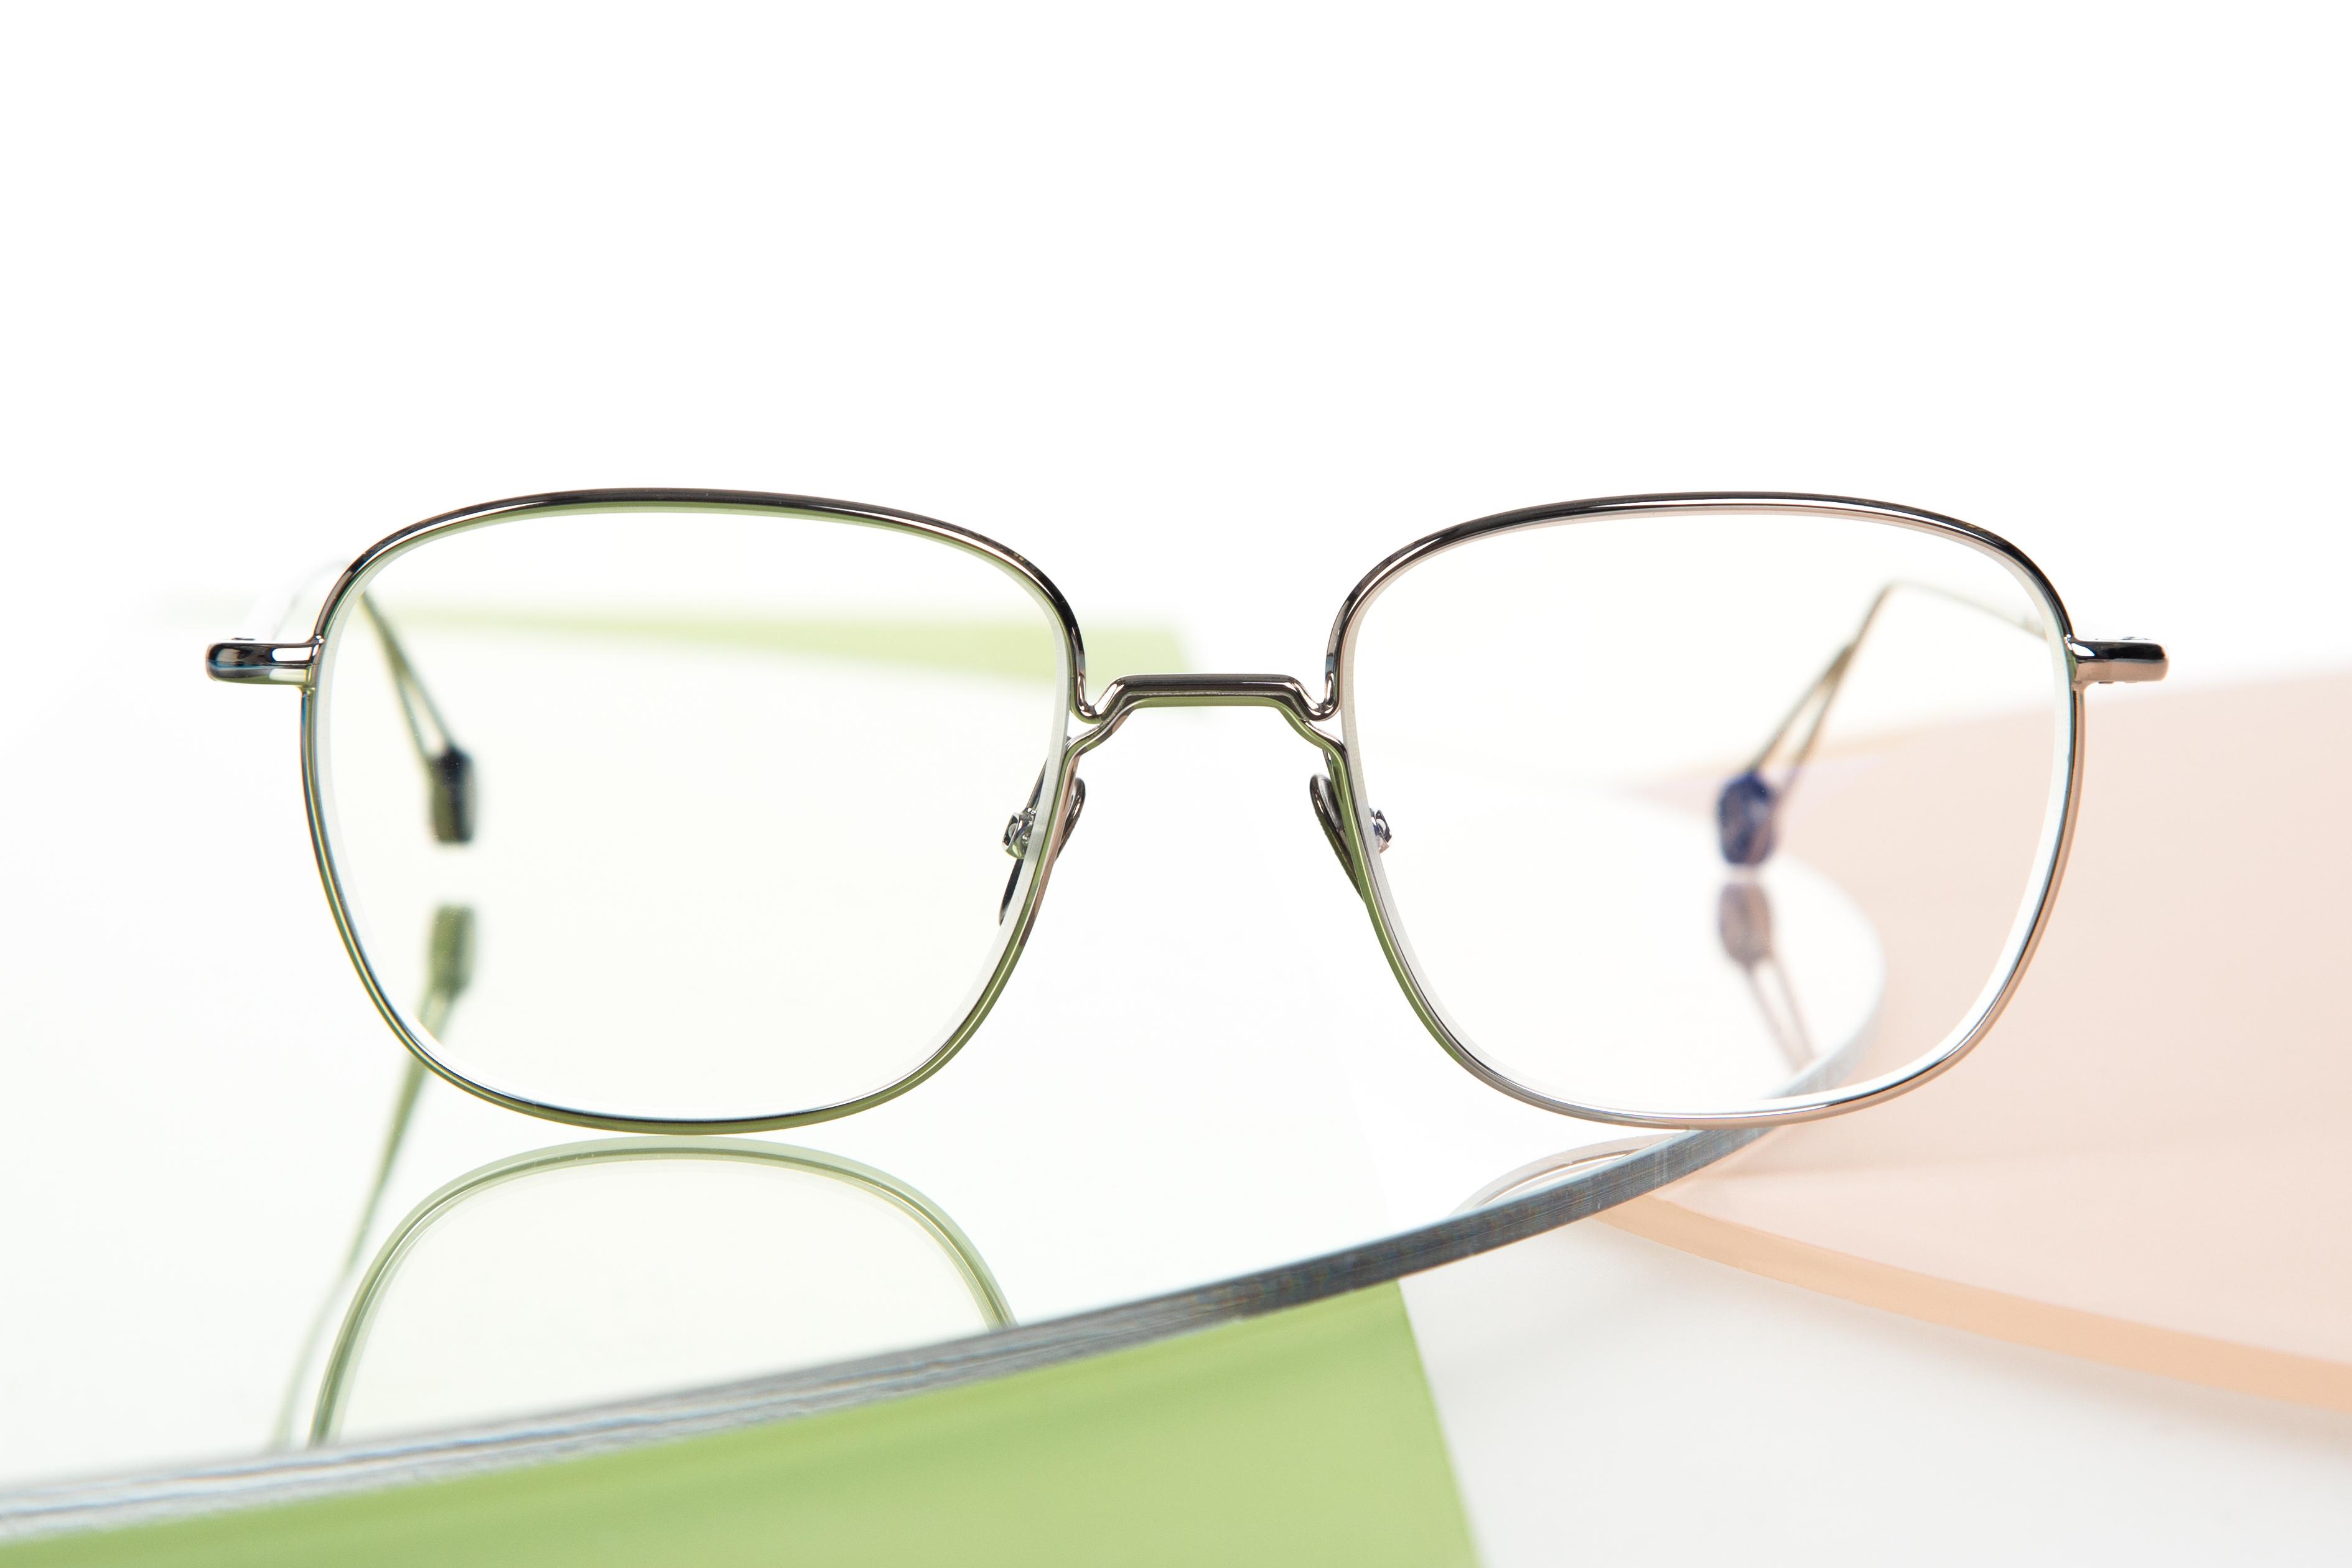 New SLEEK CONTEMPORARY MODERN Clear Lens EYE GLASSES Cool Silver Fashion Frame